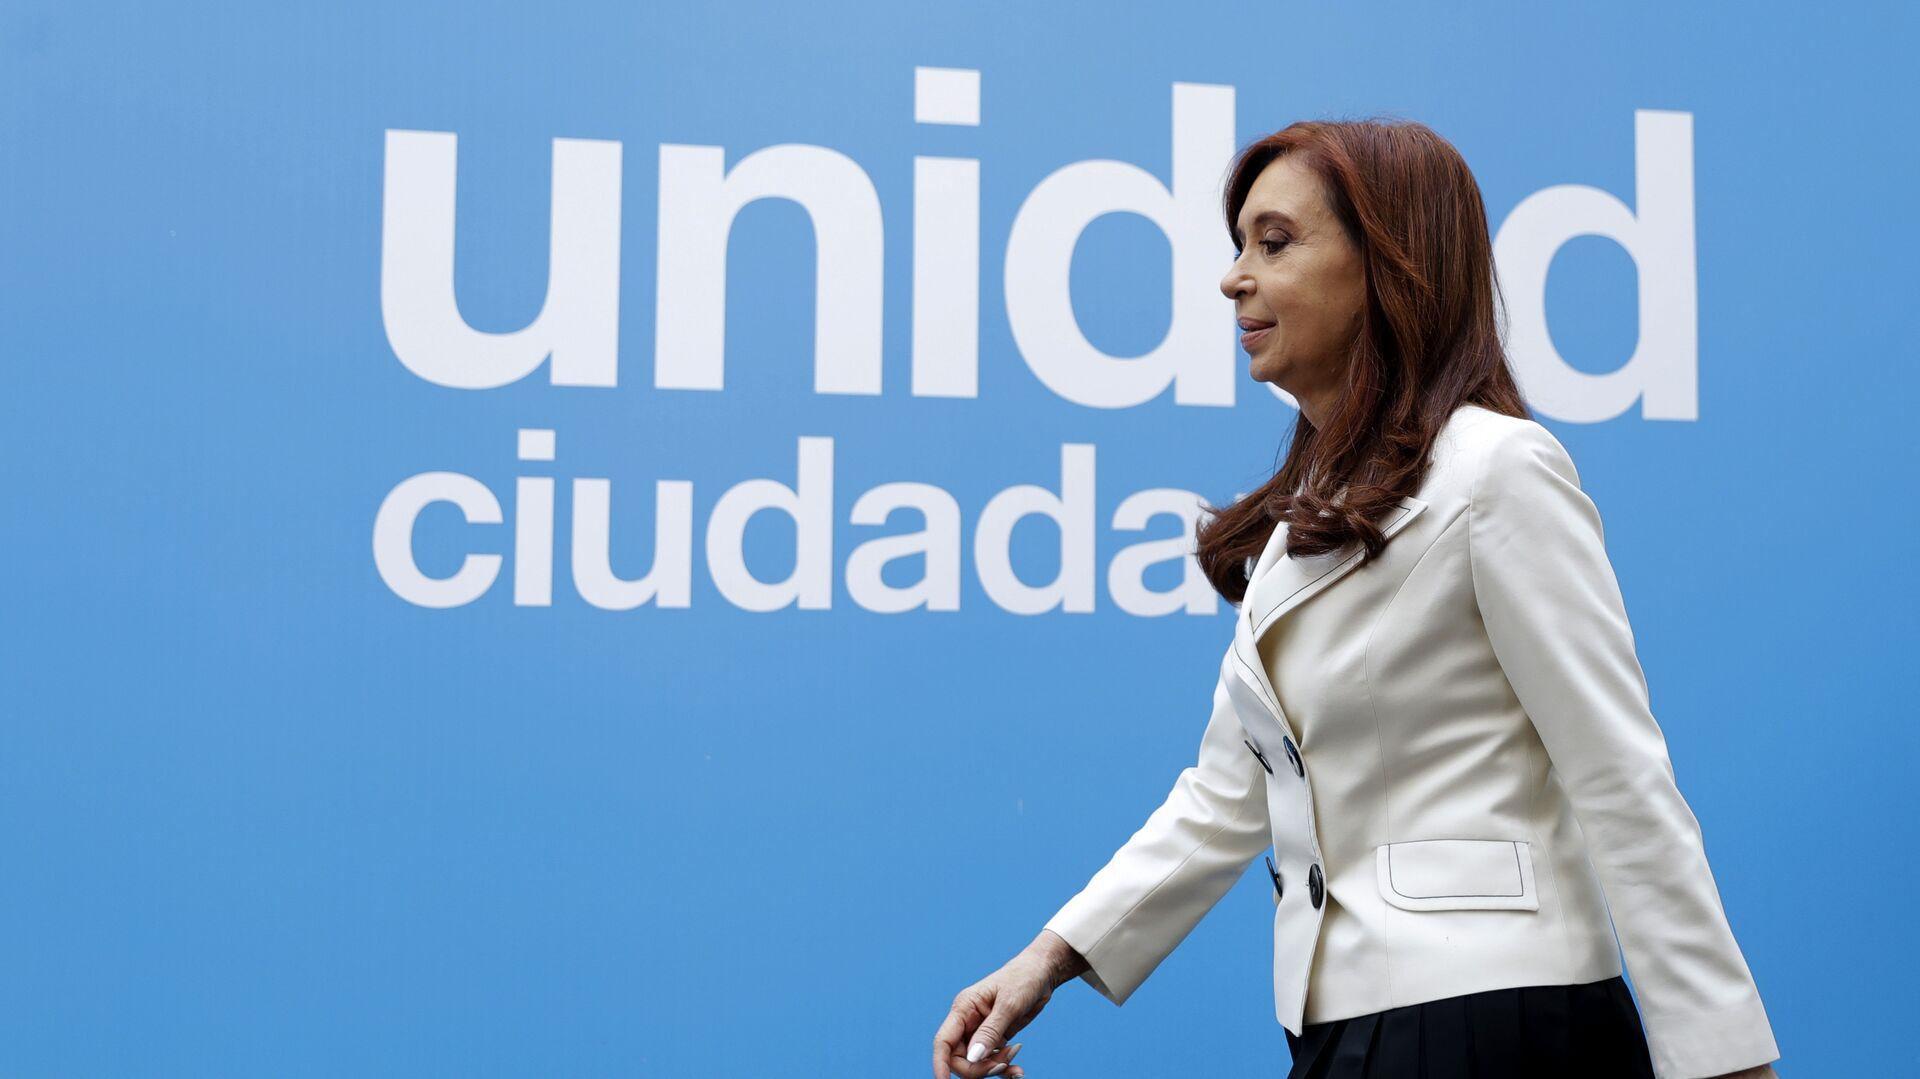 Cristina Fernández de Kirchner, expresidenta de Argentina - Sputnik Mundo, 1920, 17.08.2021